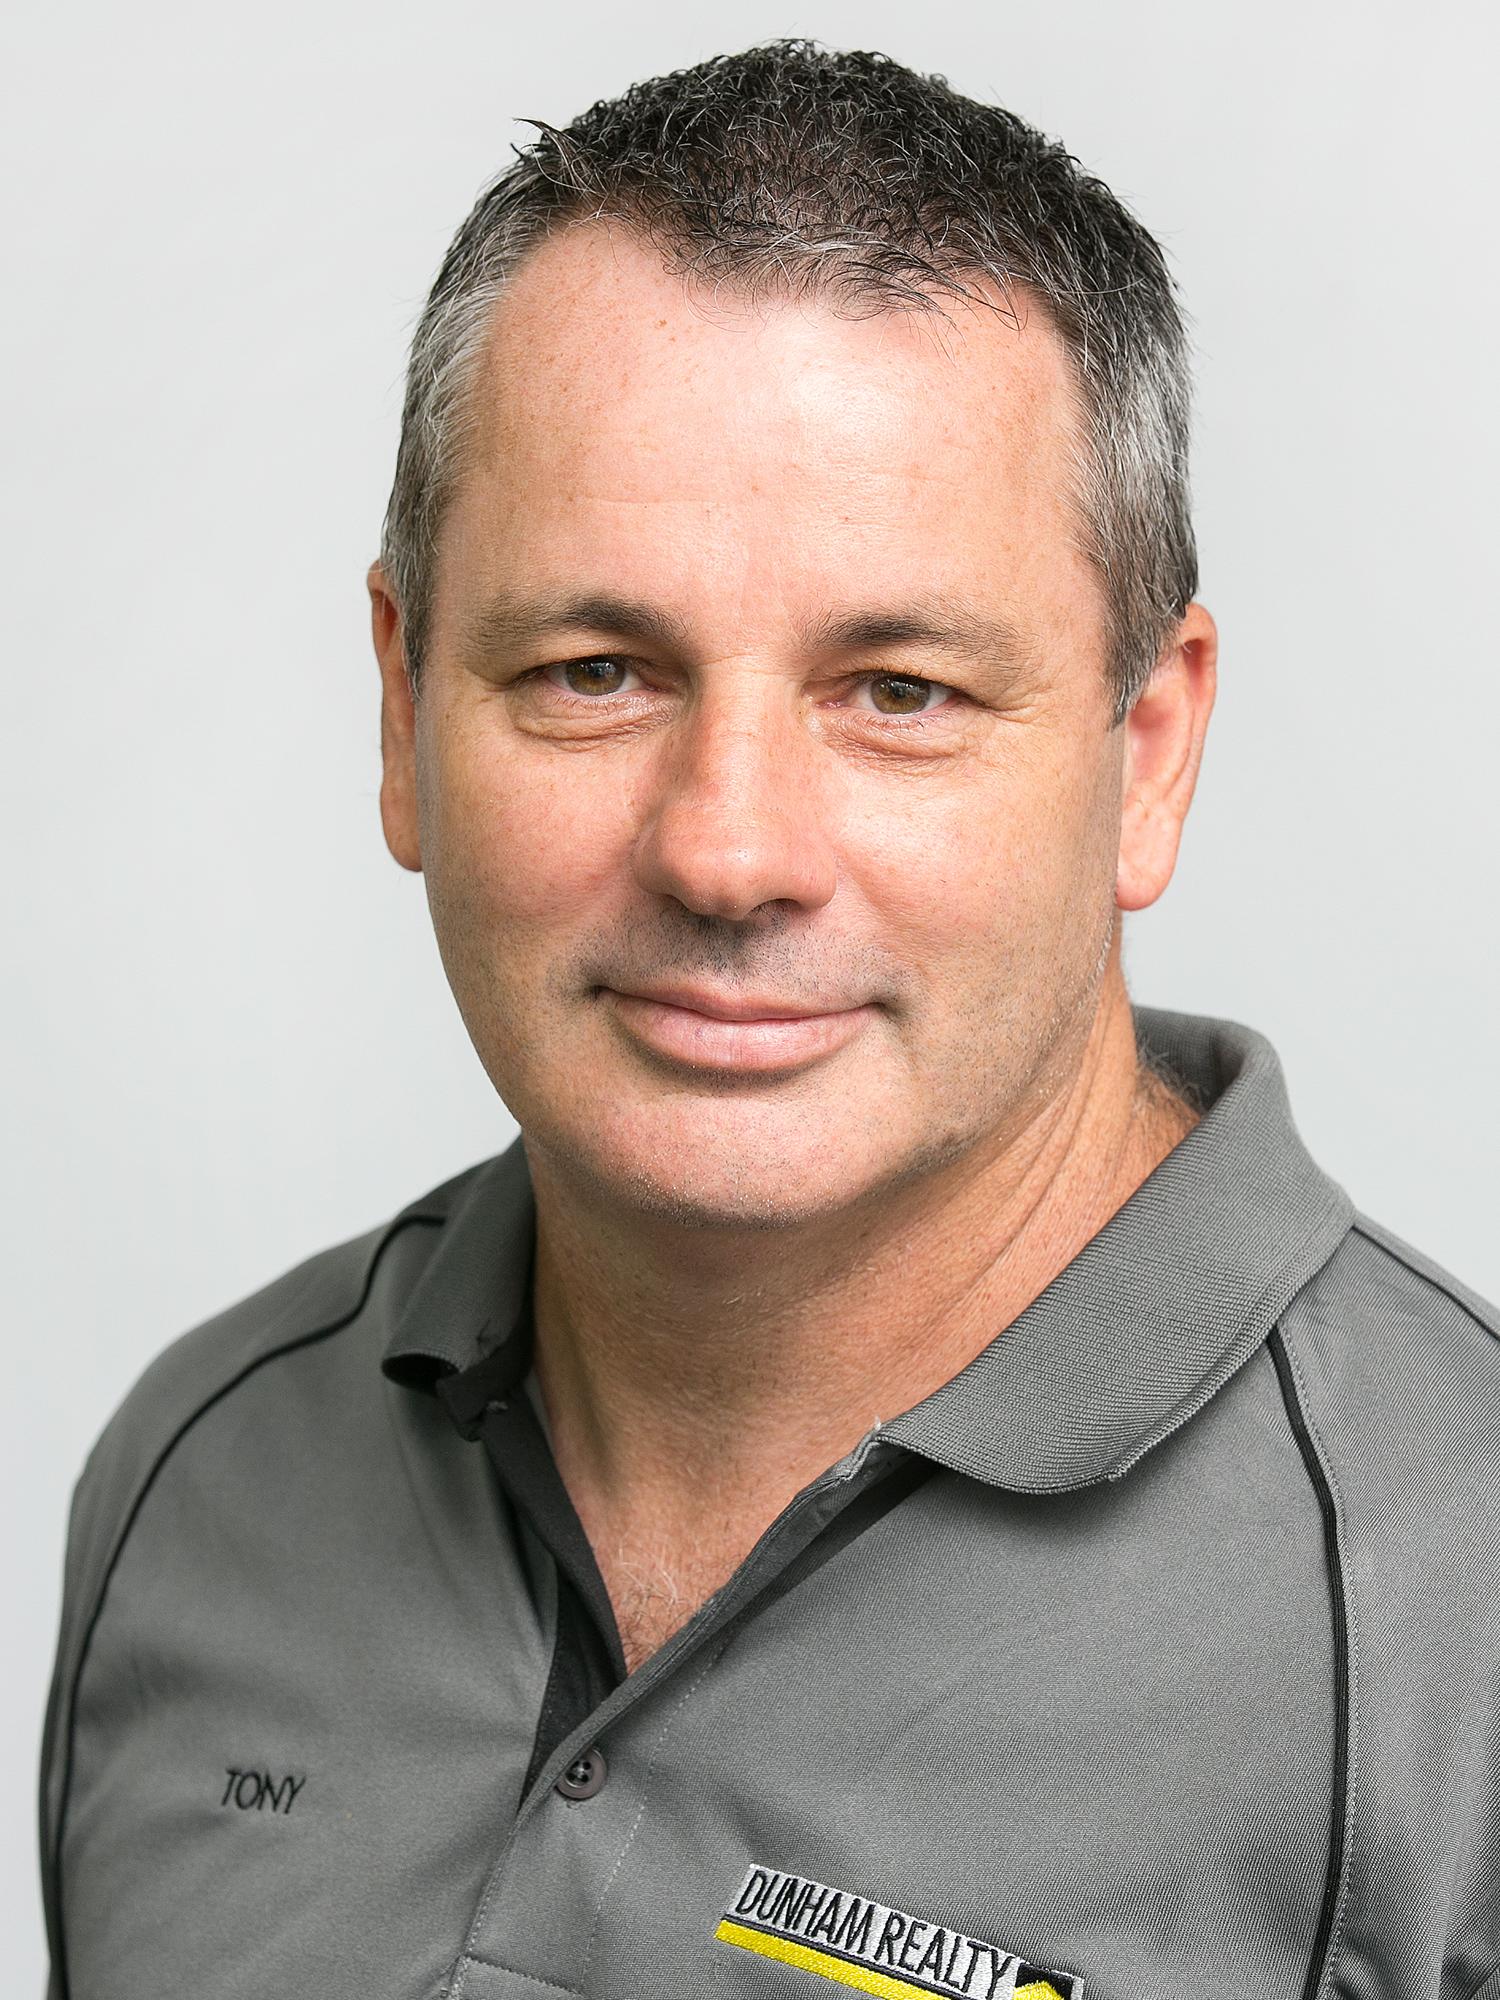 Tony  Burnside